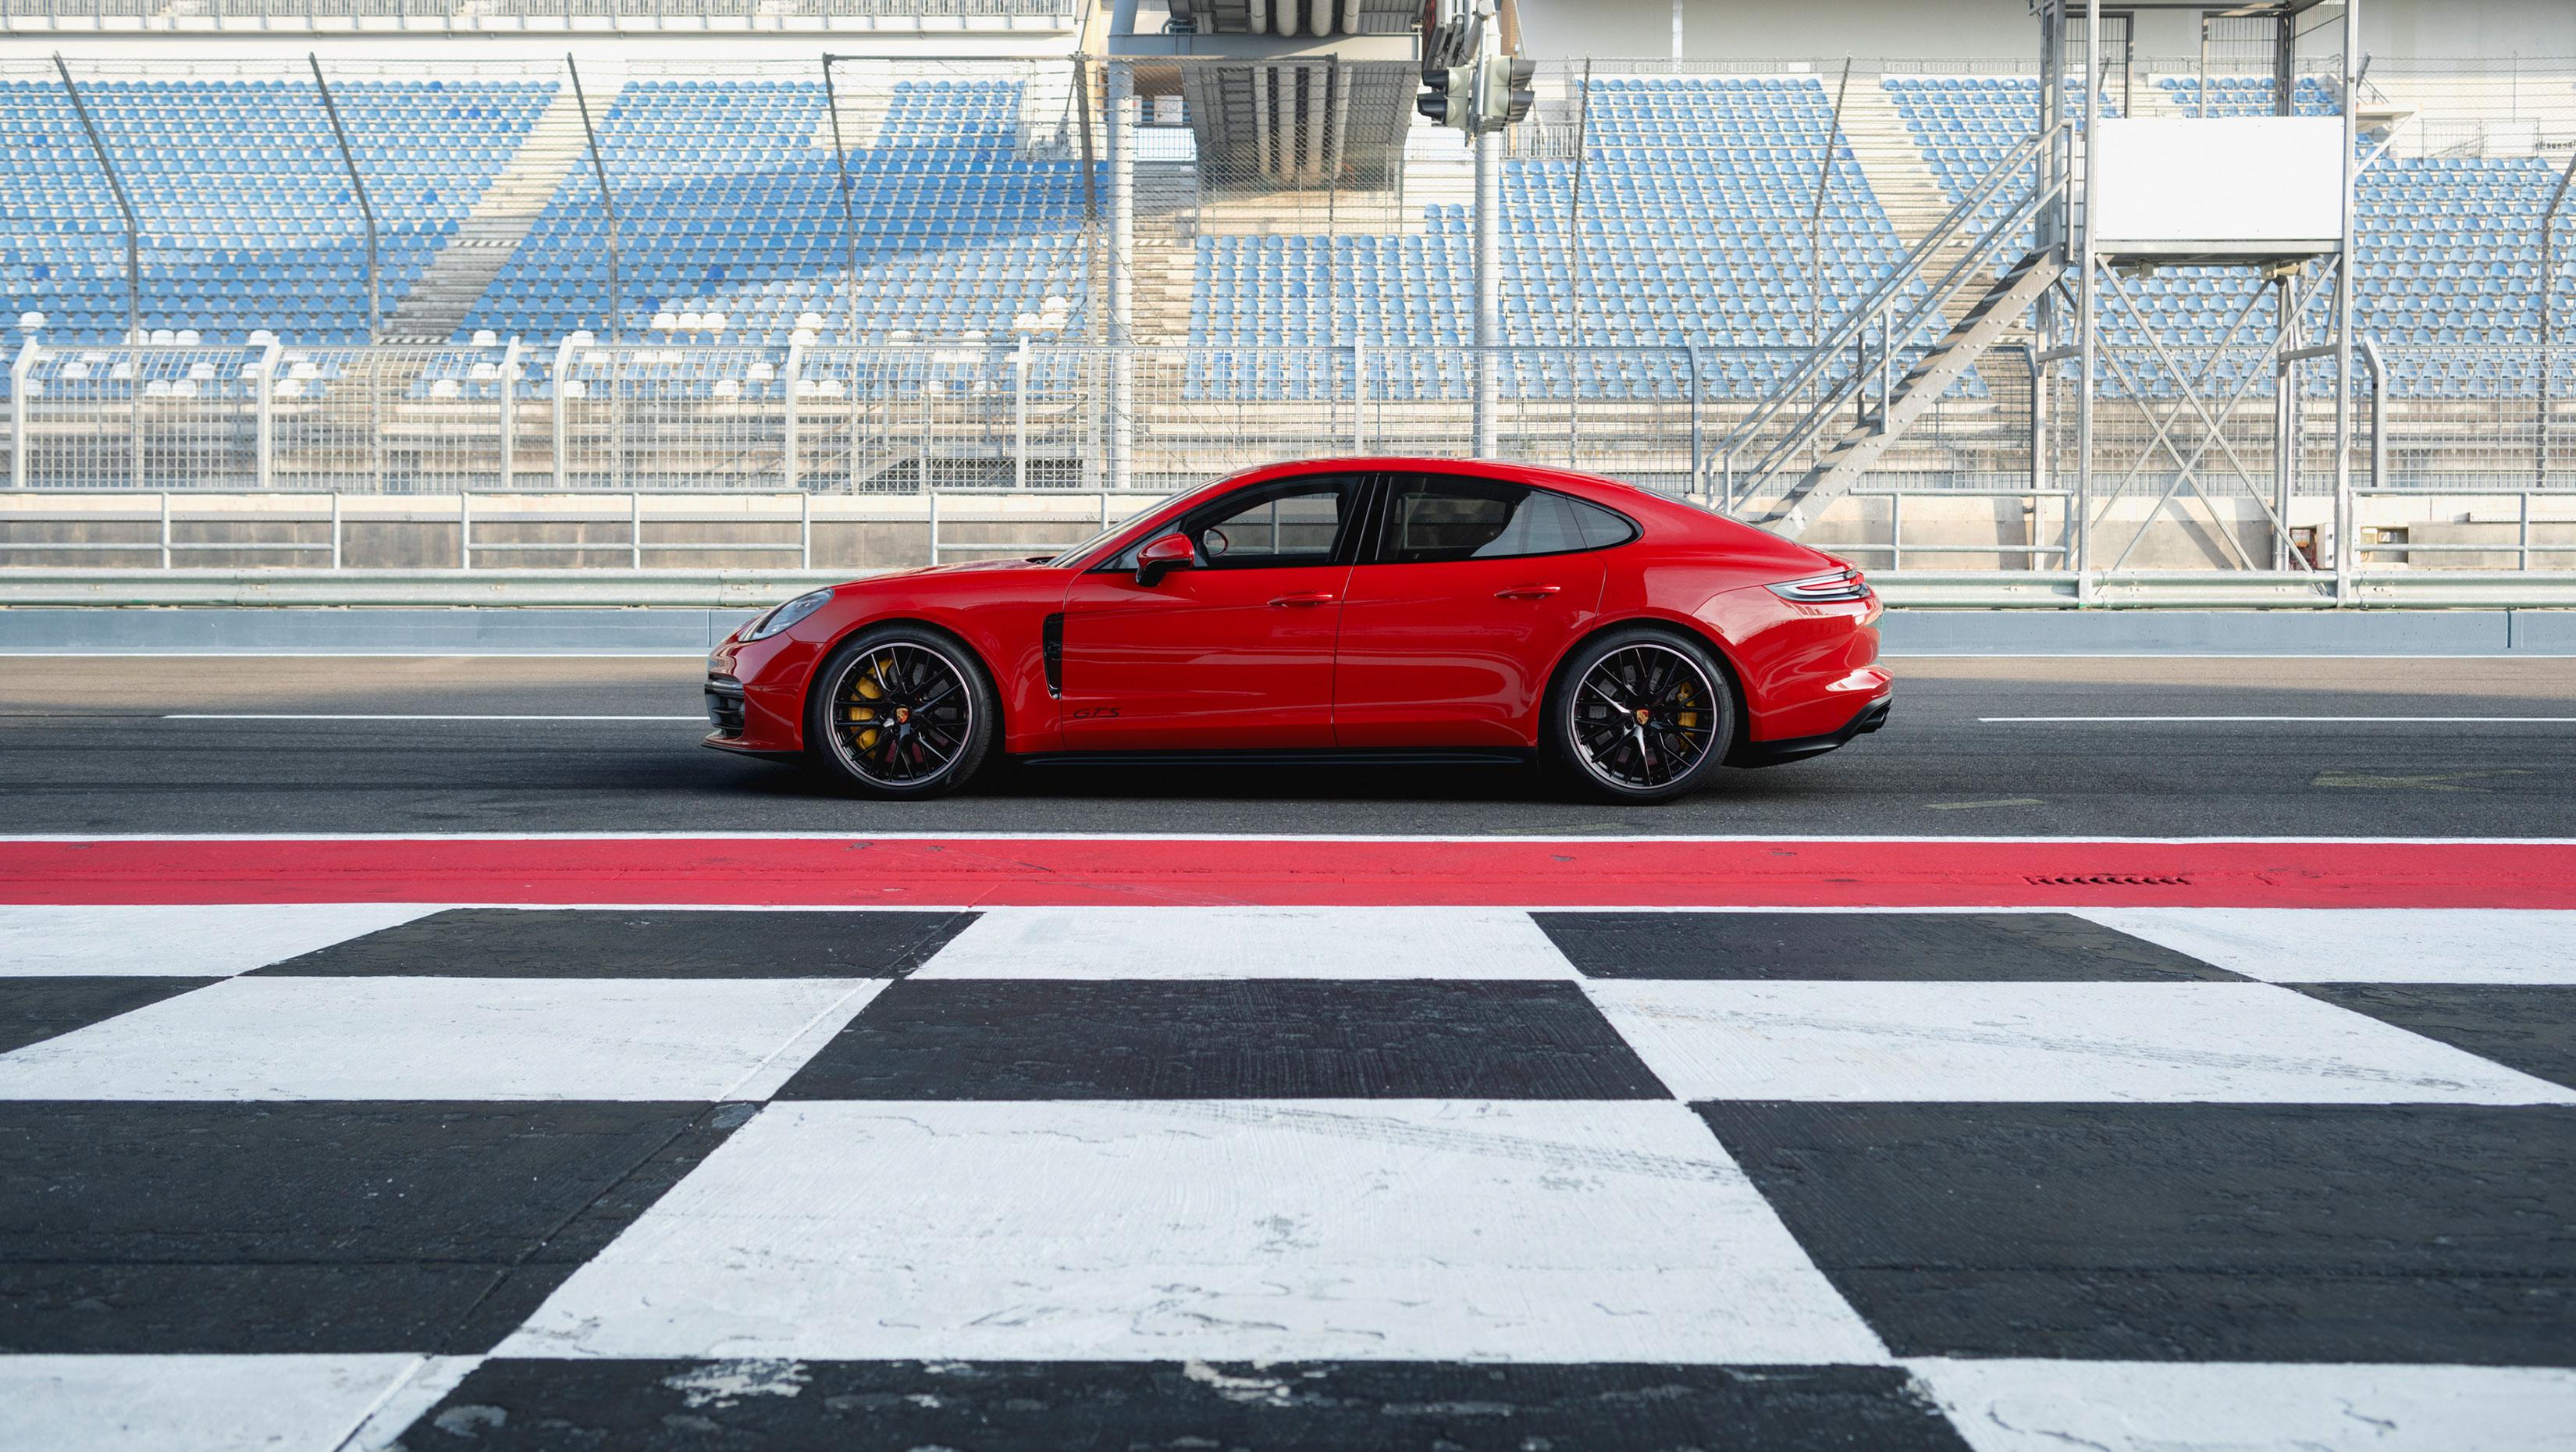 2019 Porsche Panamera Gts And Sport Turismo